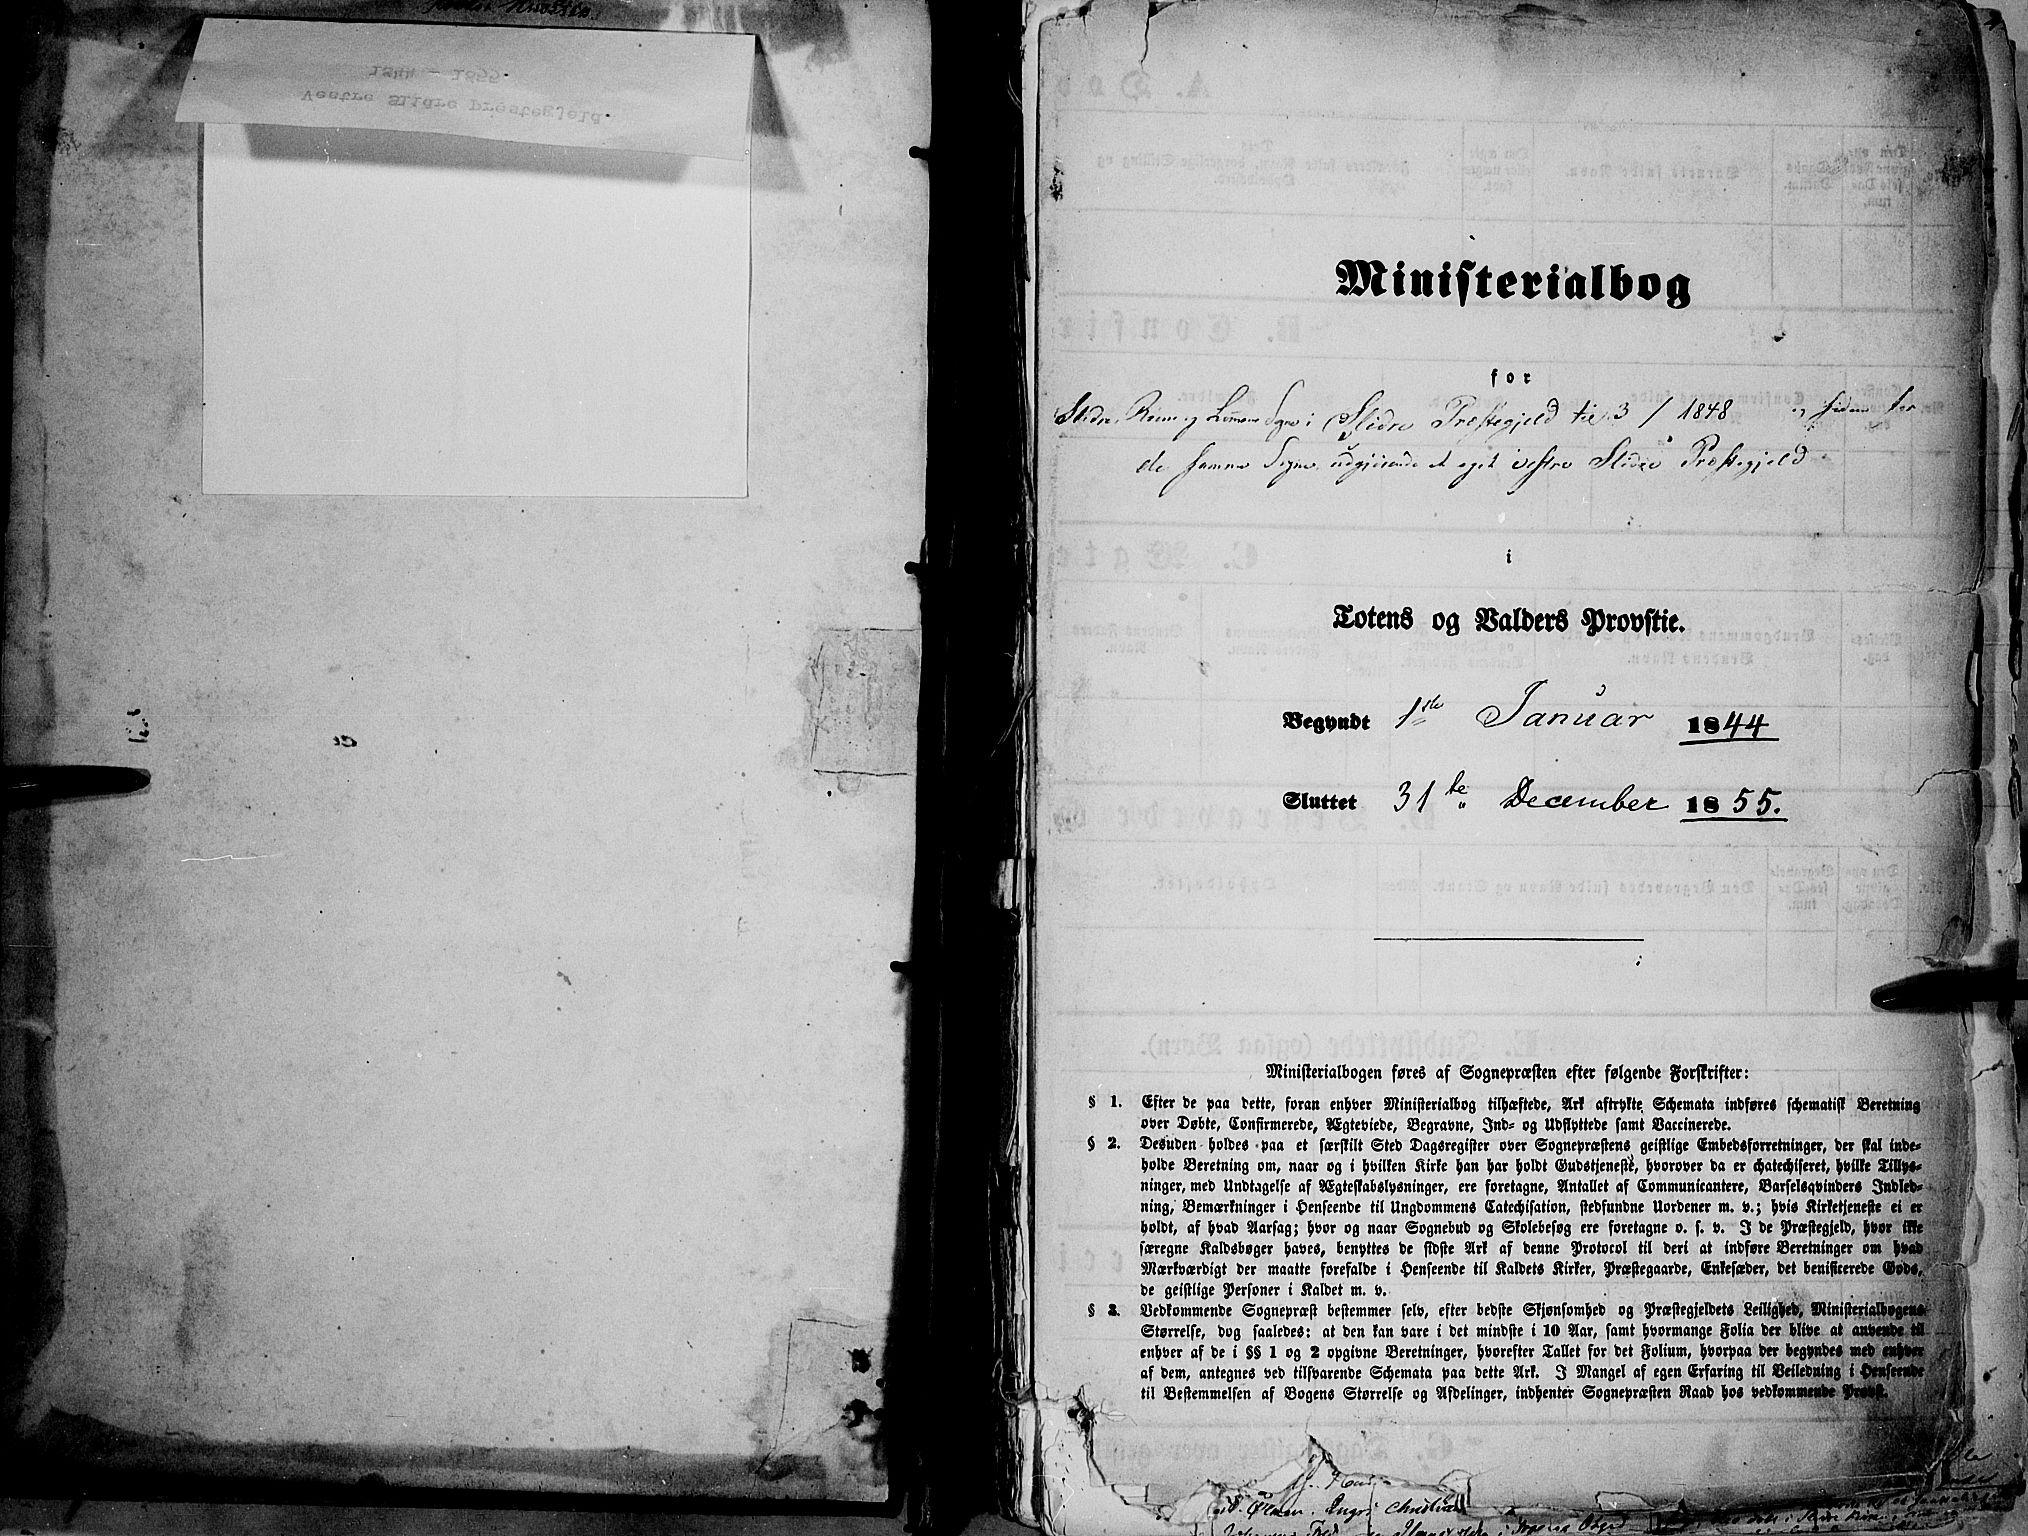 SAH, Vestre Slidre prestekontor, Ministerialbok nr. 1, 1844-1855